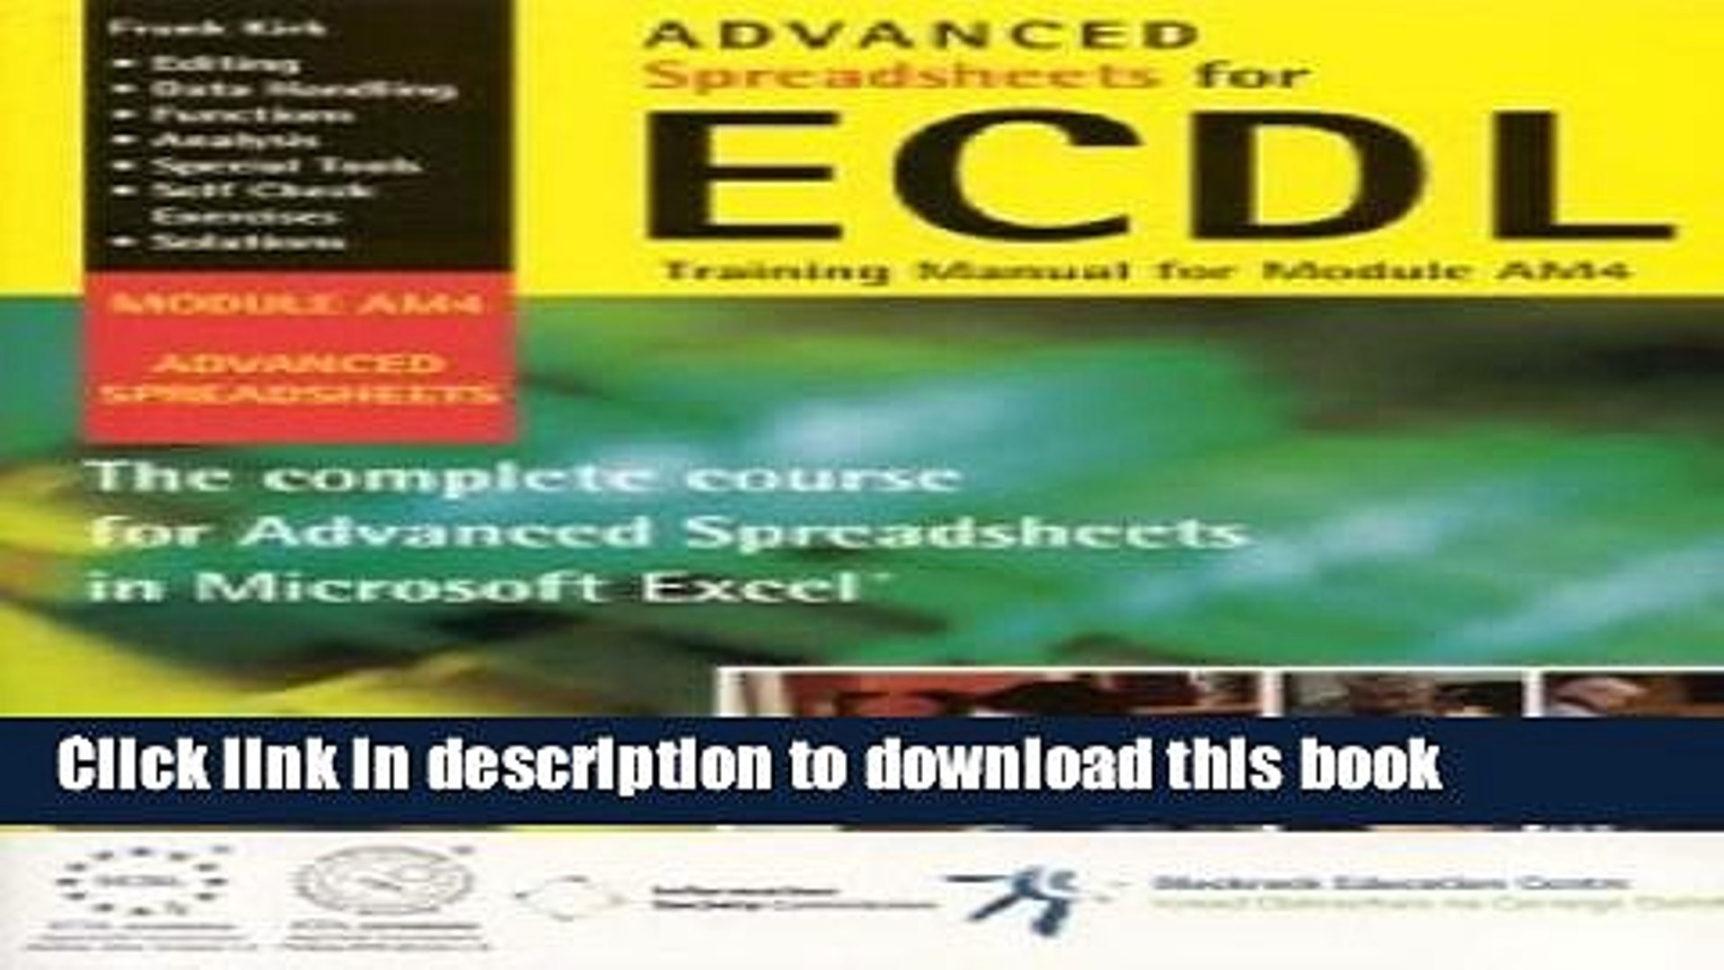 Ecdl Spreadsheets Spreadshee Ecdl Spreadsheets Revision Ecdl Spreadsheets Advanced Ecdl